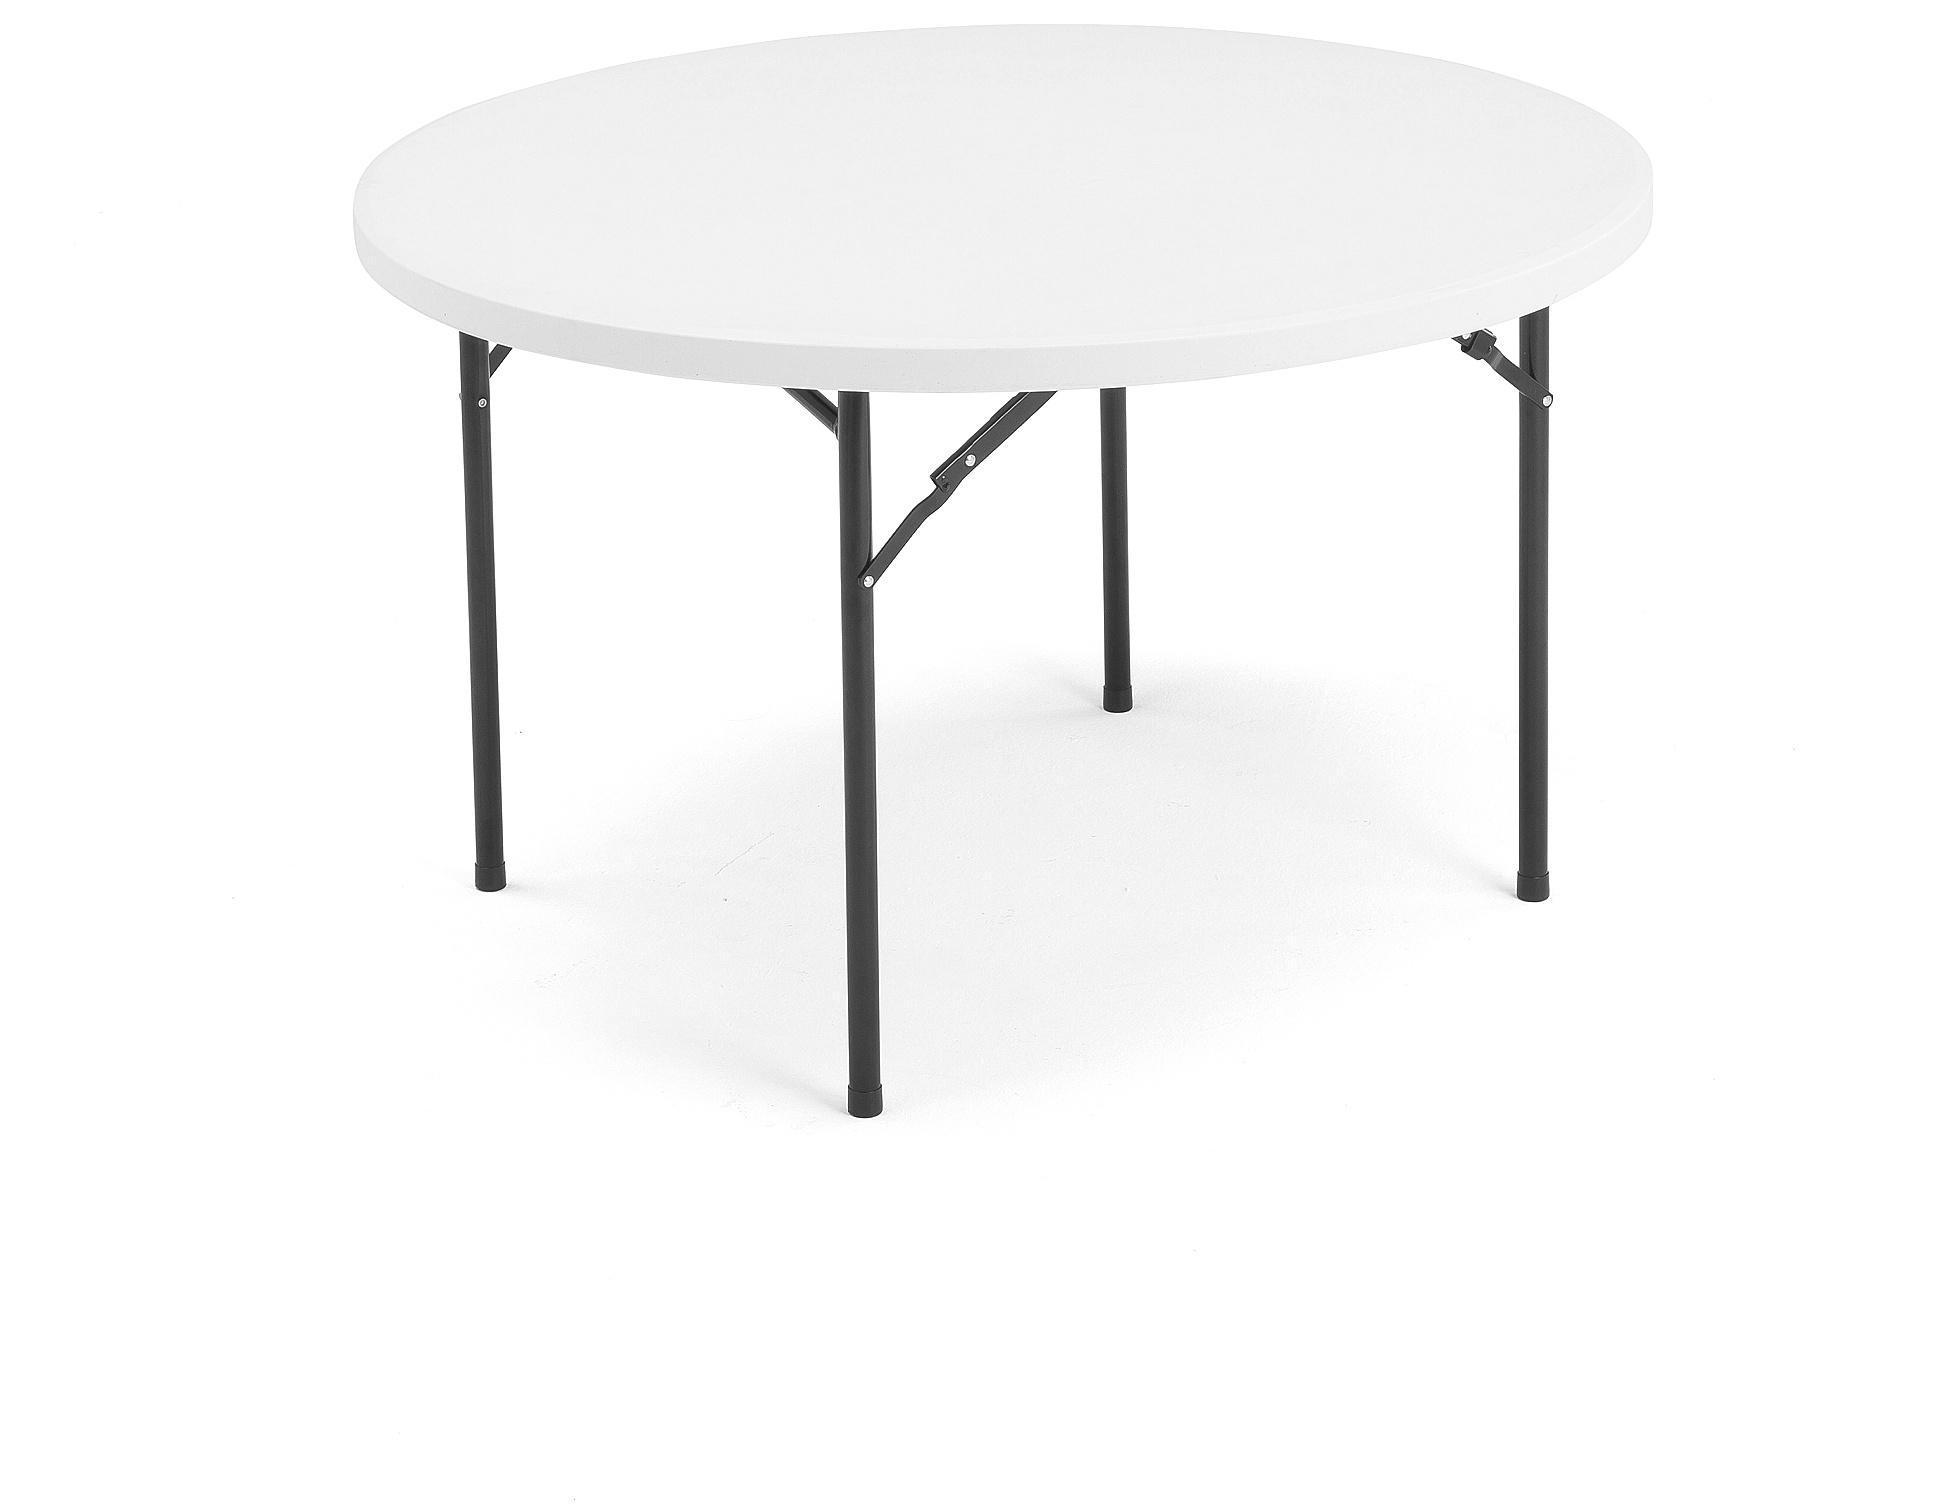 Skladací stôl Mika, Ø1220 mm, plast